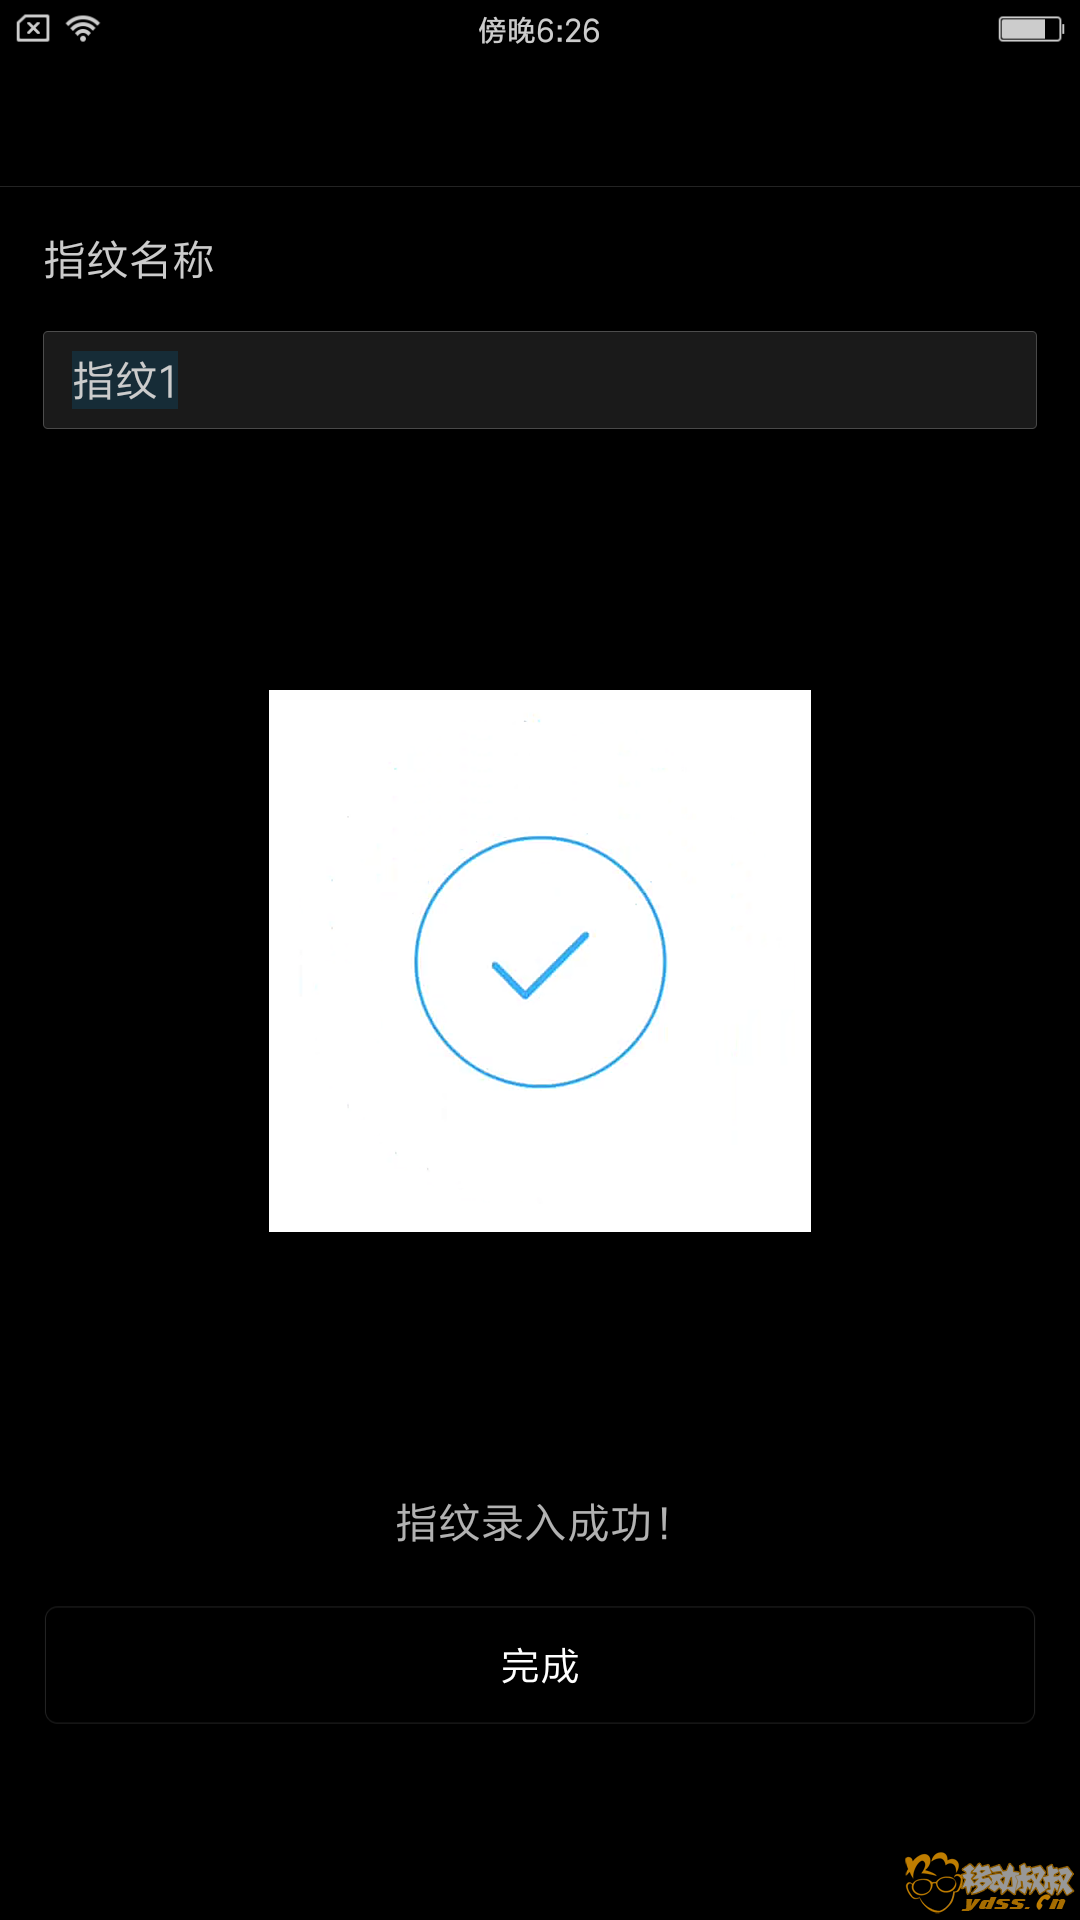 Screenshot_2017-12-30-18-26-46-351_com.android.settings.png